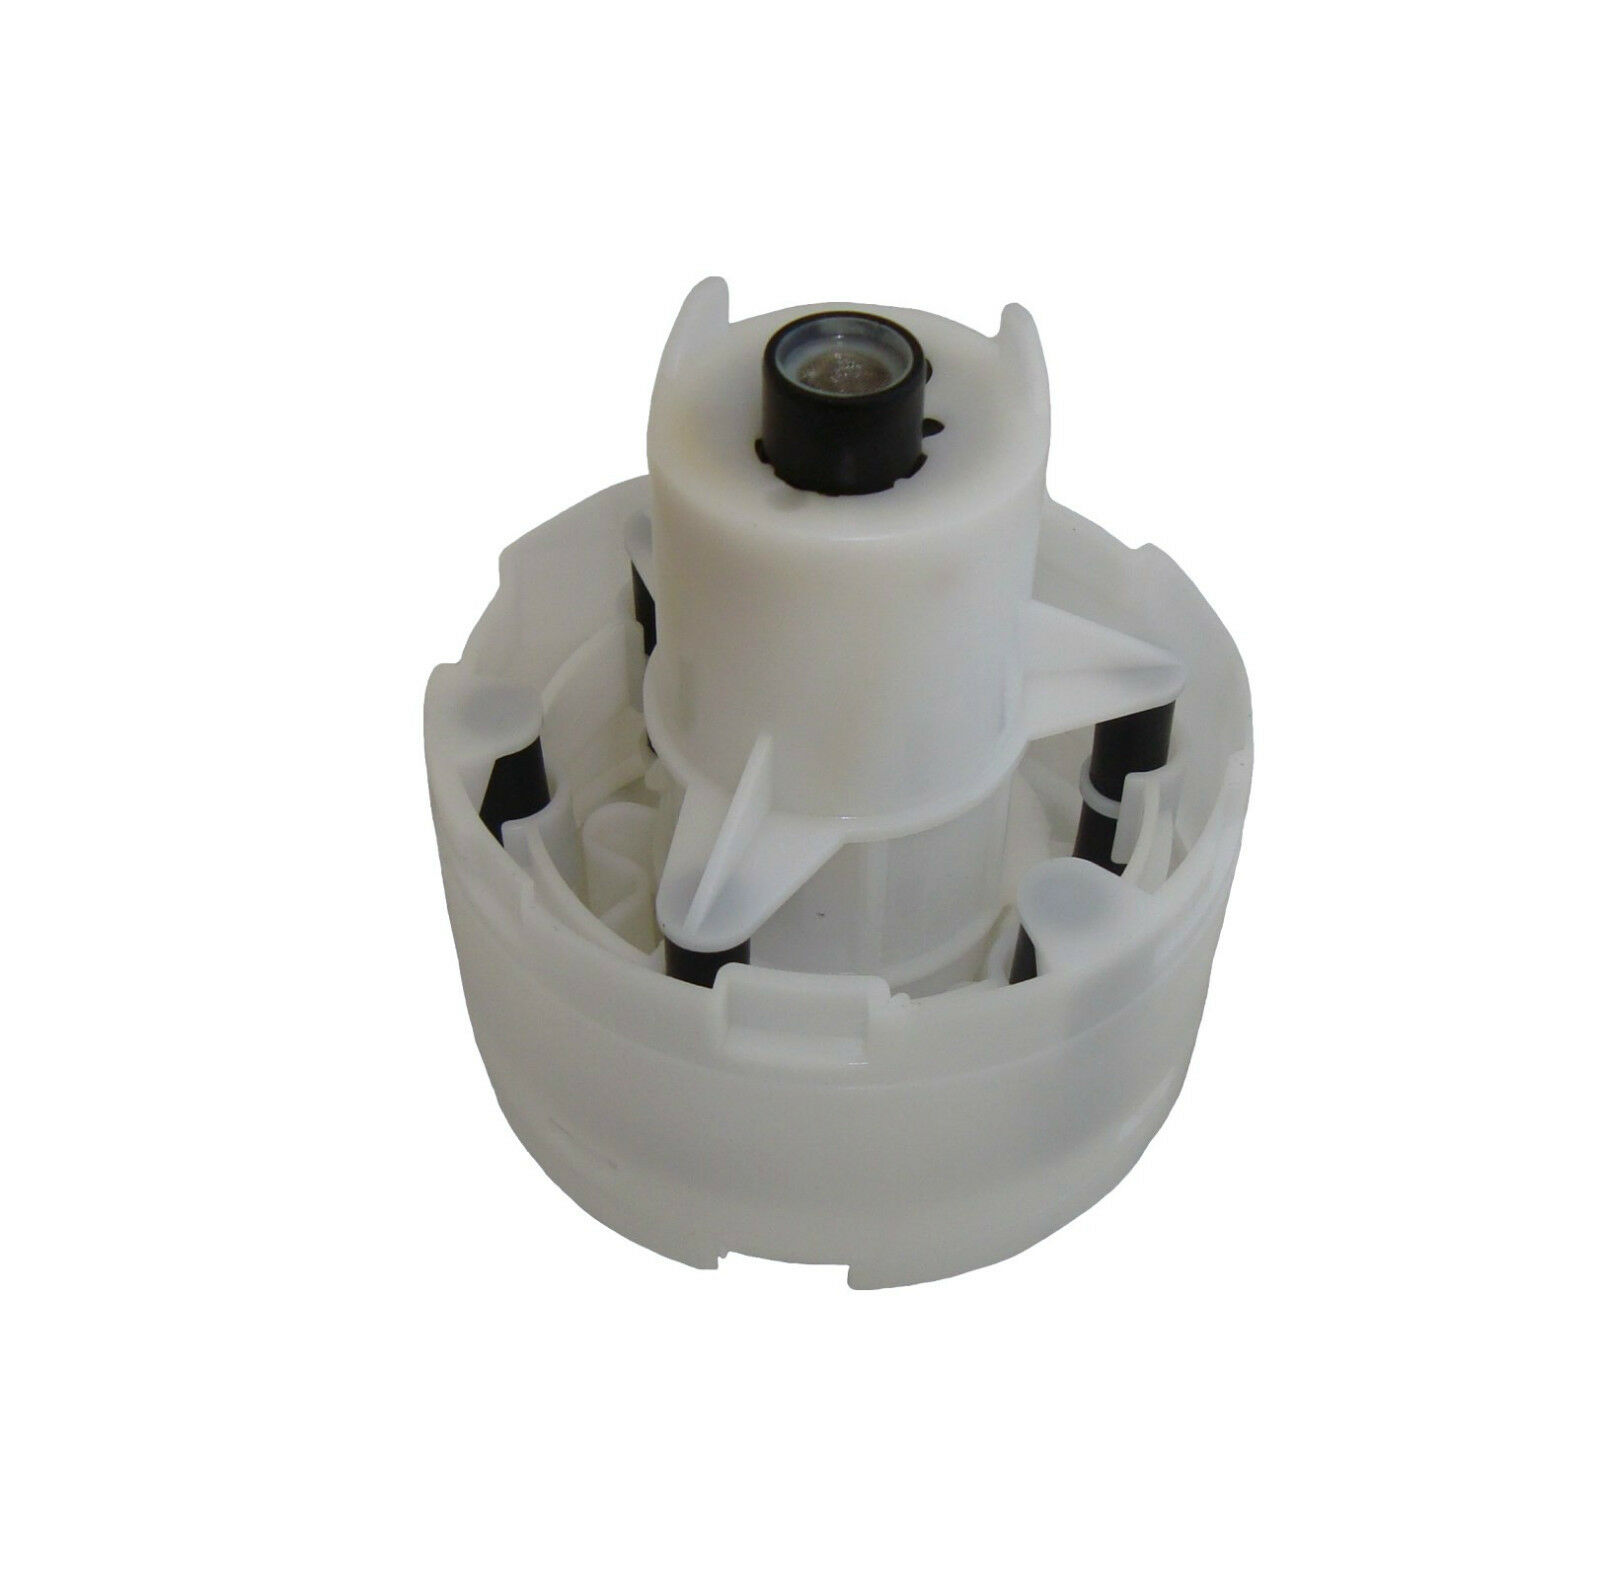 Fuel Pump for VW Passat GLS GLX 4 Motion Audi A6 Quattro Avant 8E0906087D Elec